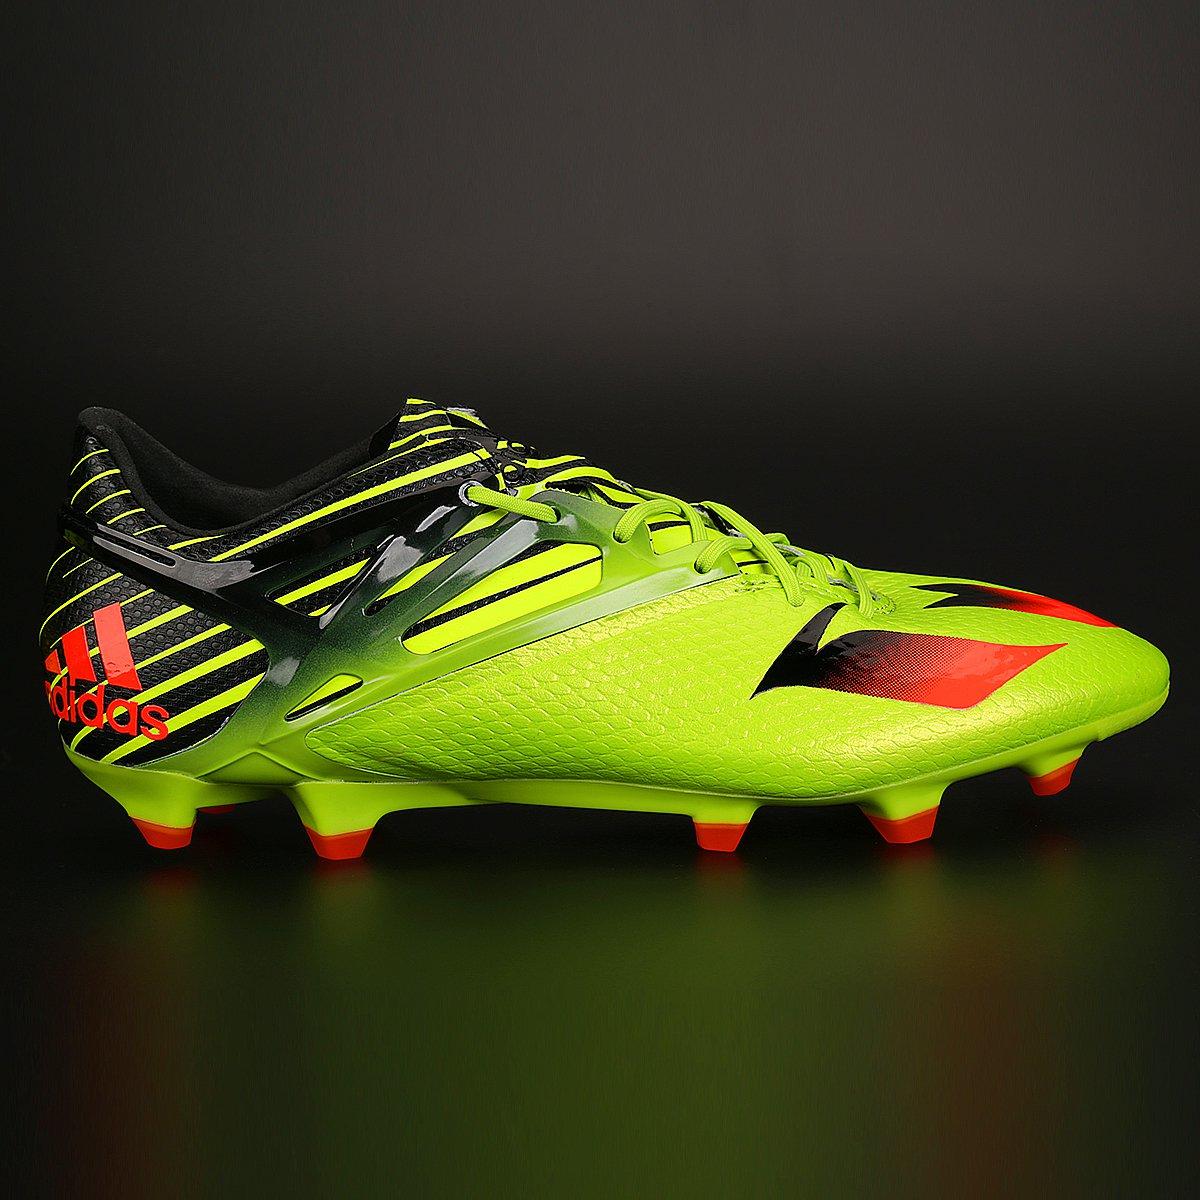 Campo Chuteira Adidas Messi 15.1 FG  83bac1cb1b776